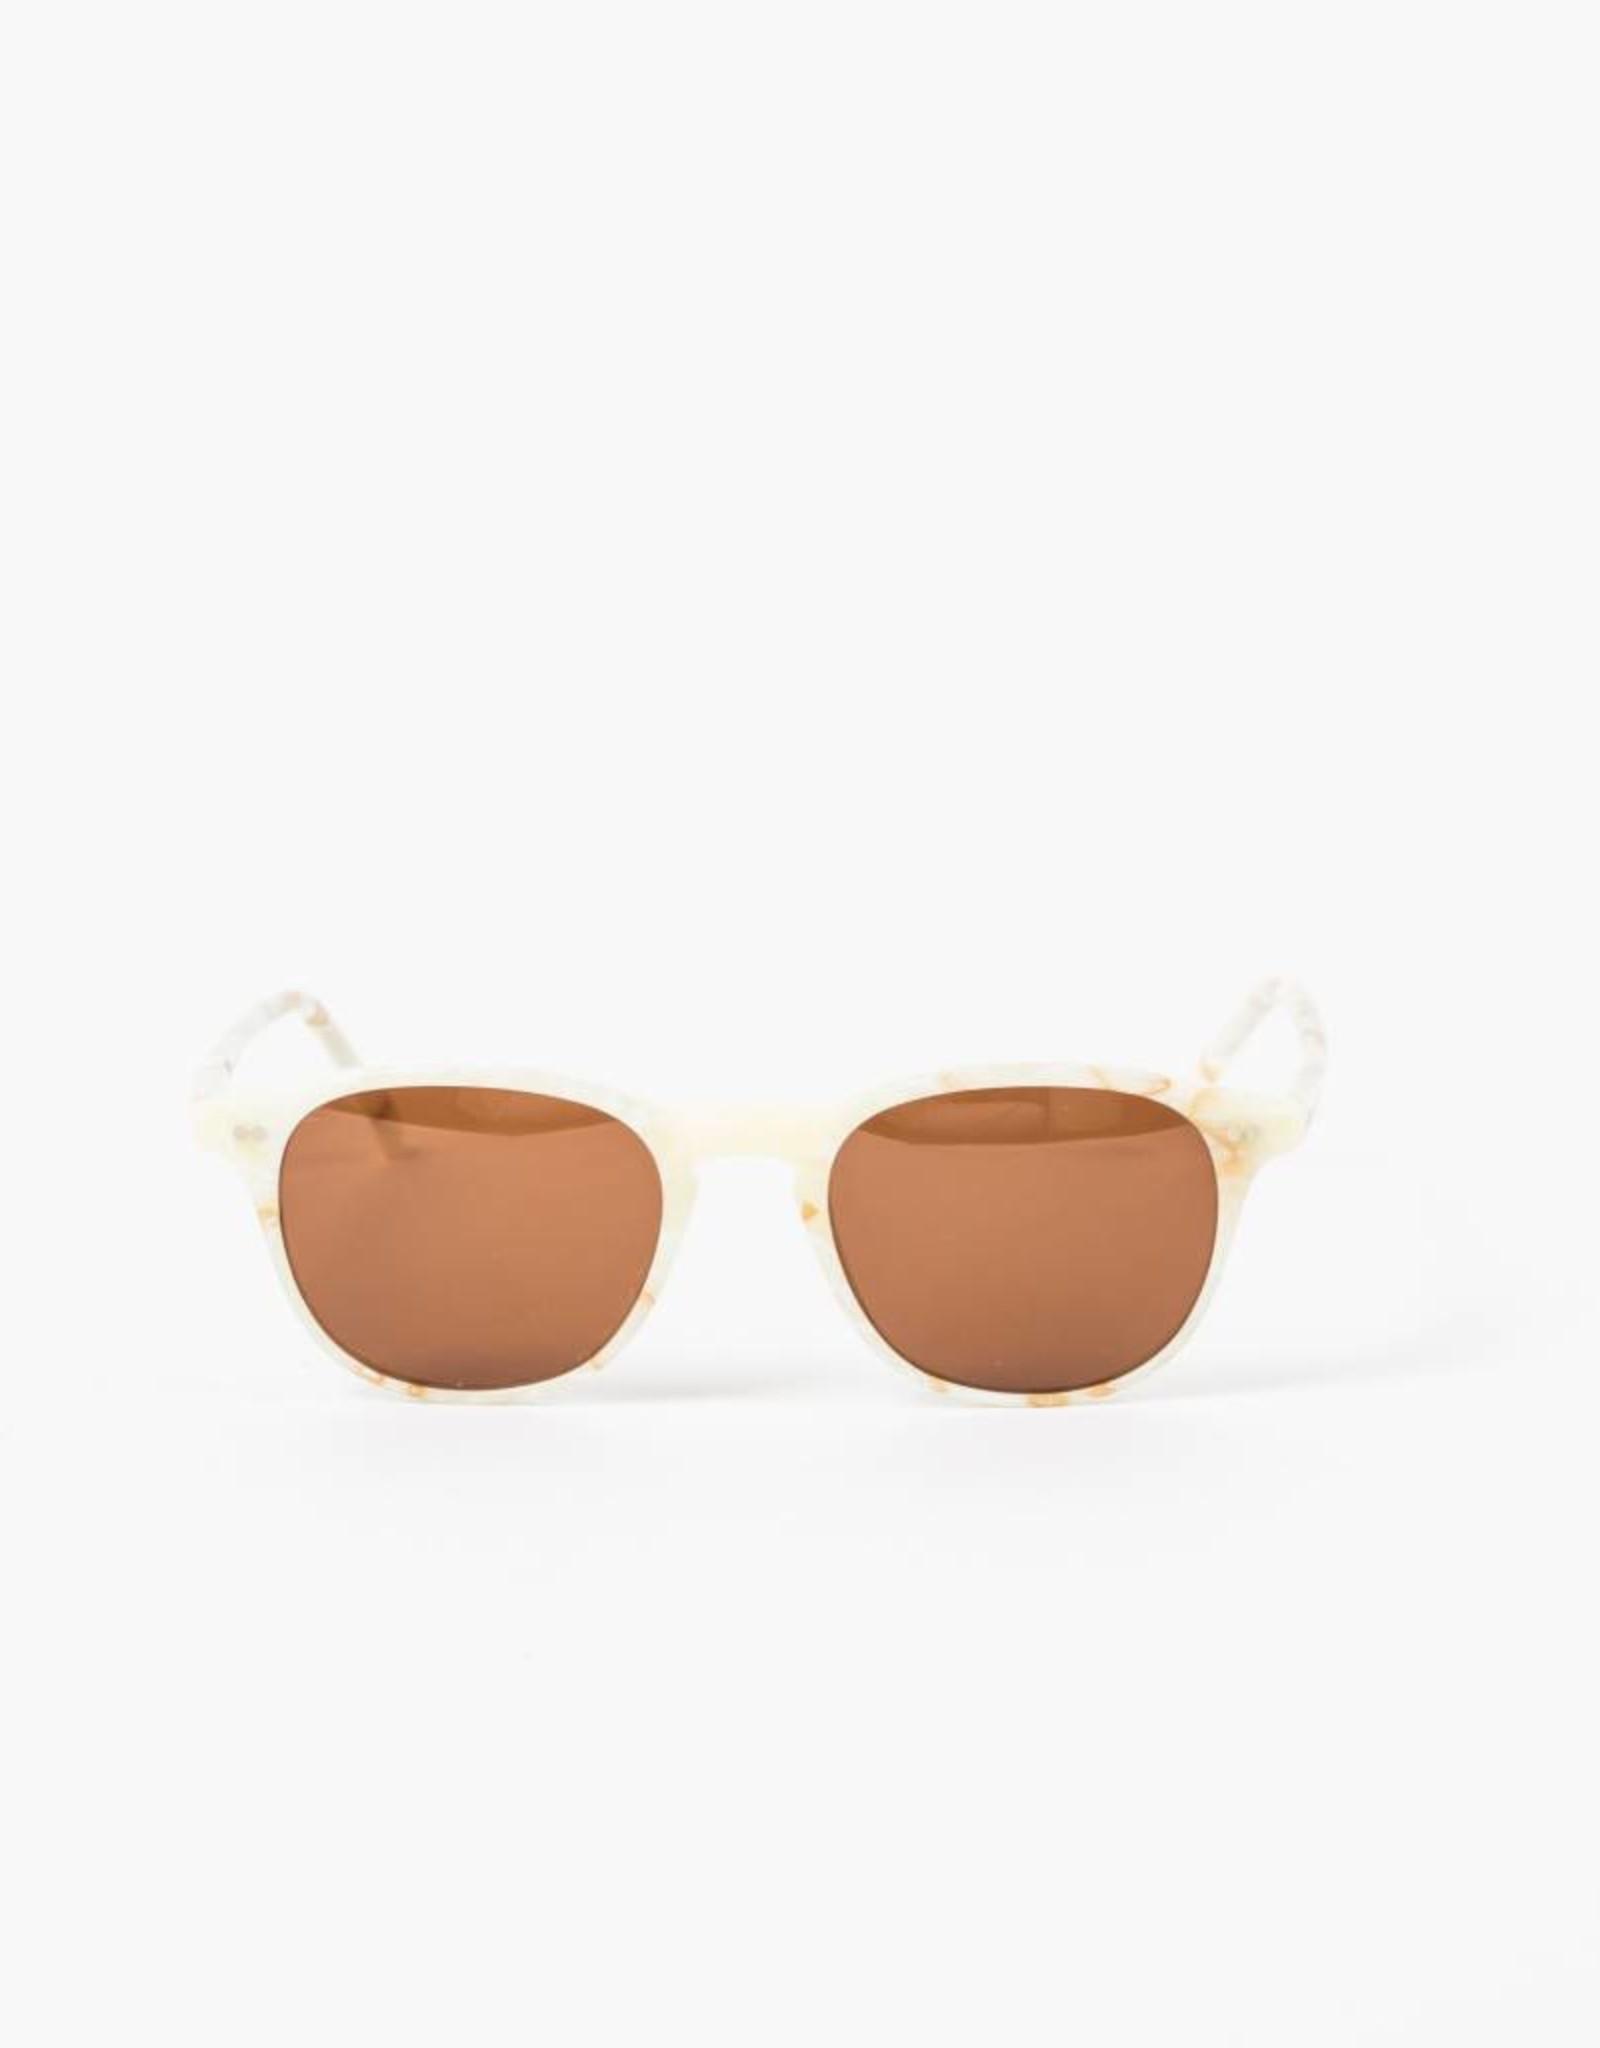 Illesteva Whitman Cream Marble Sunglasses